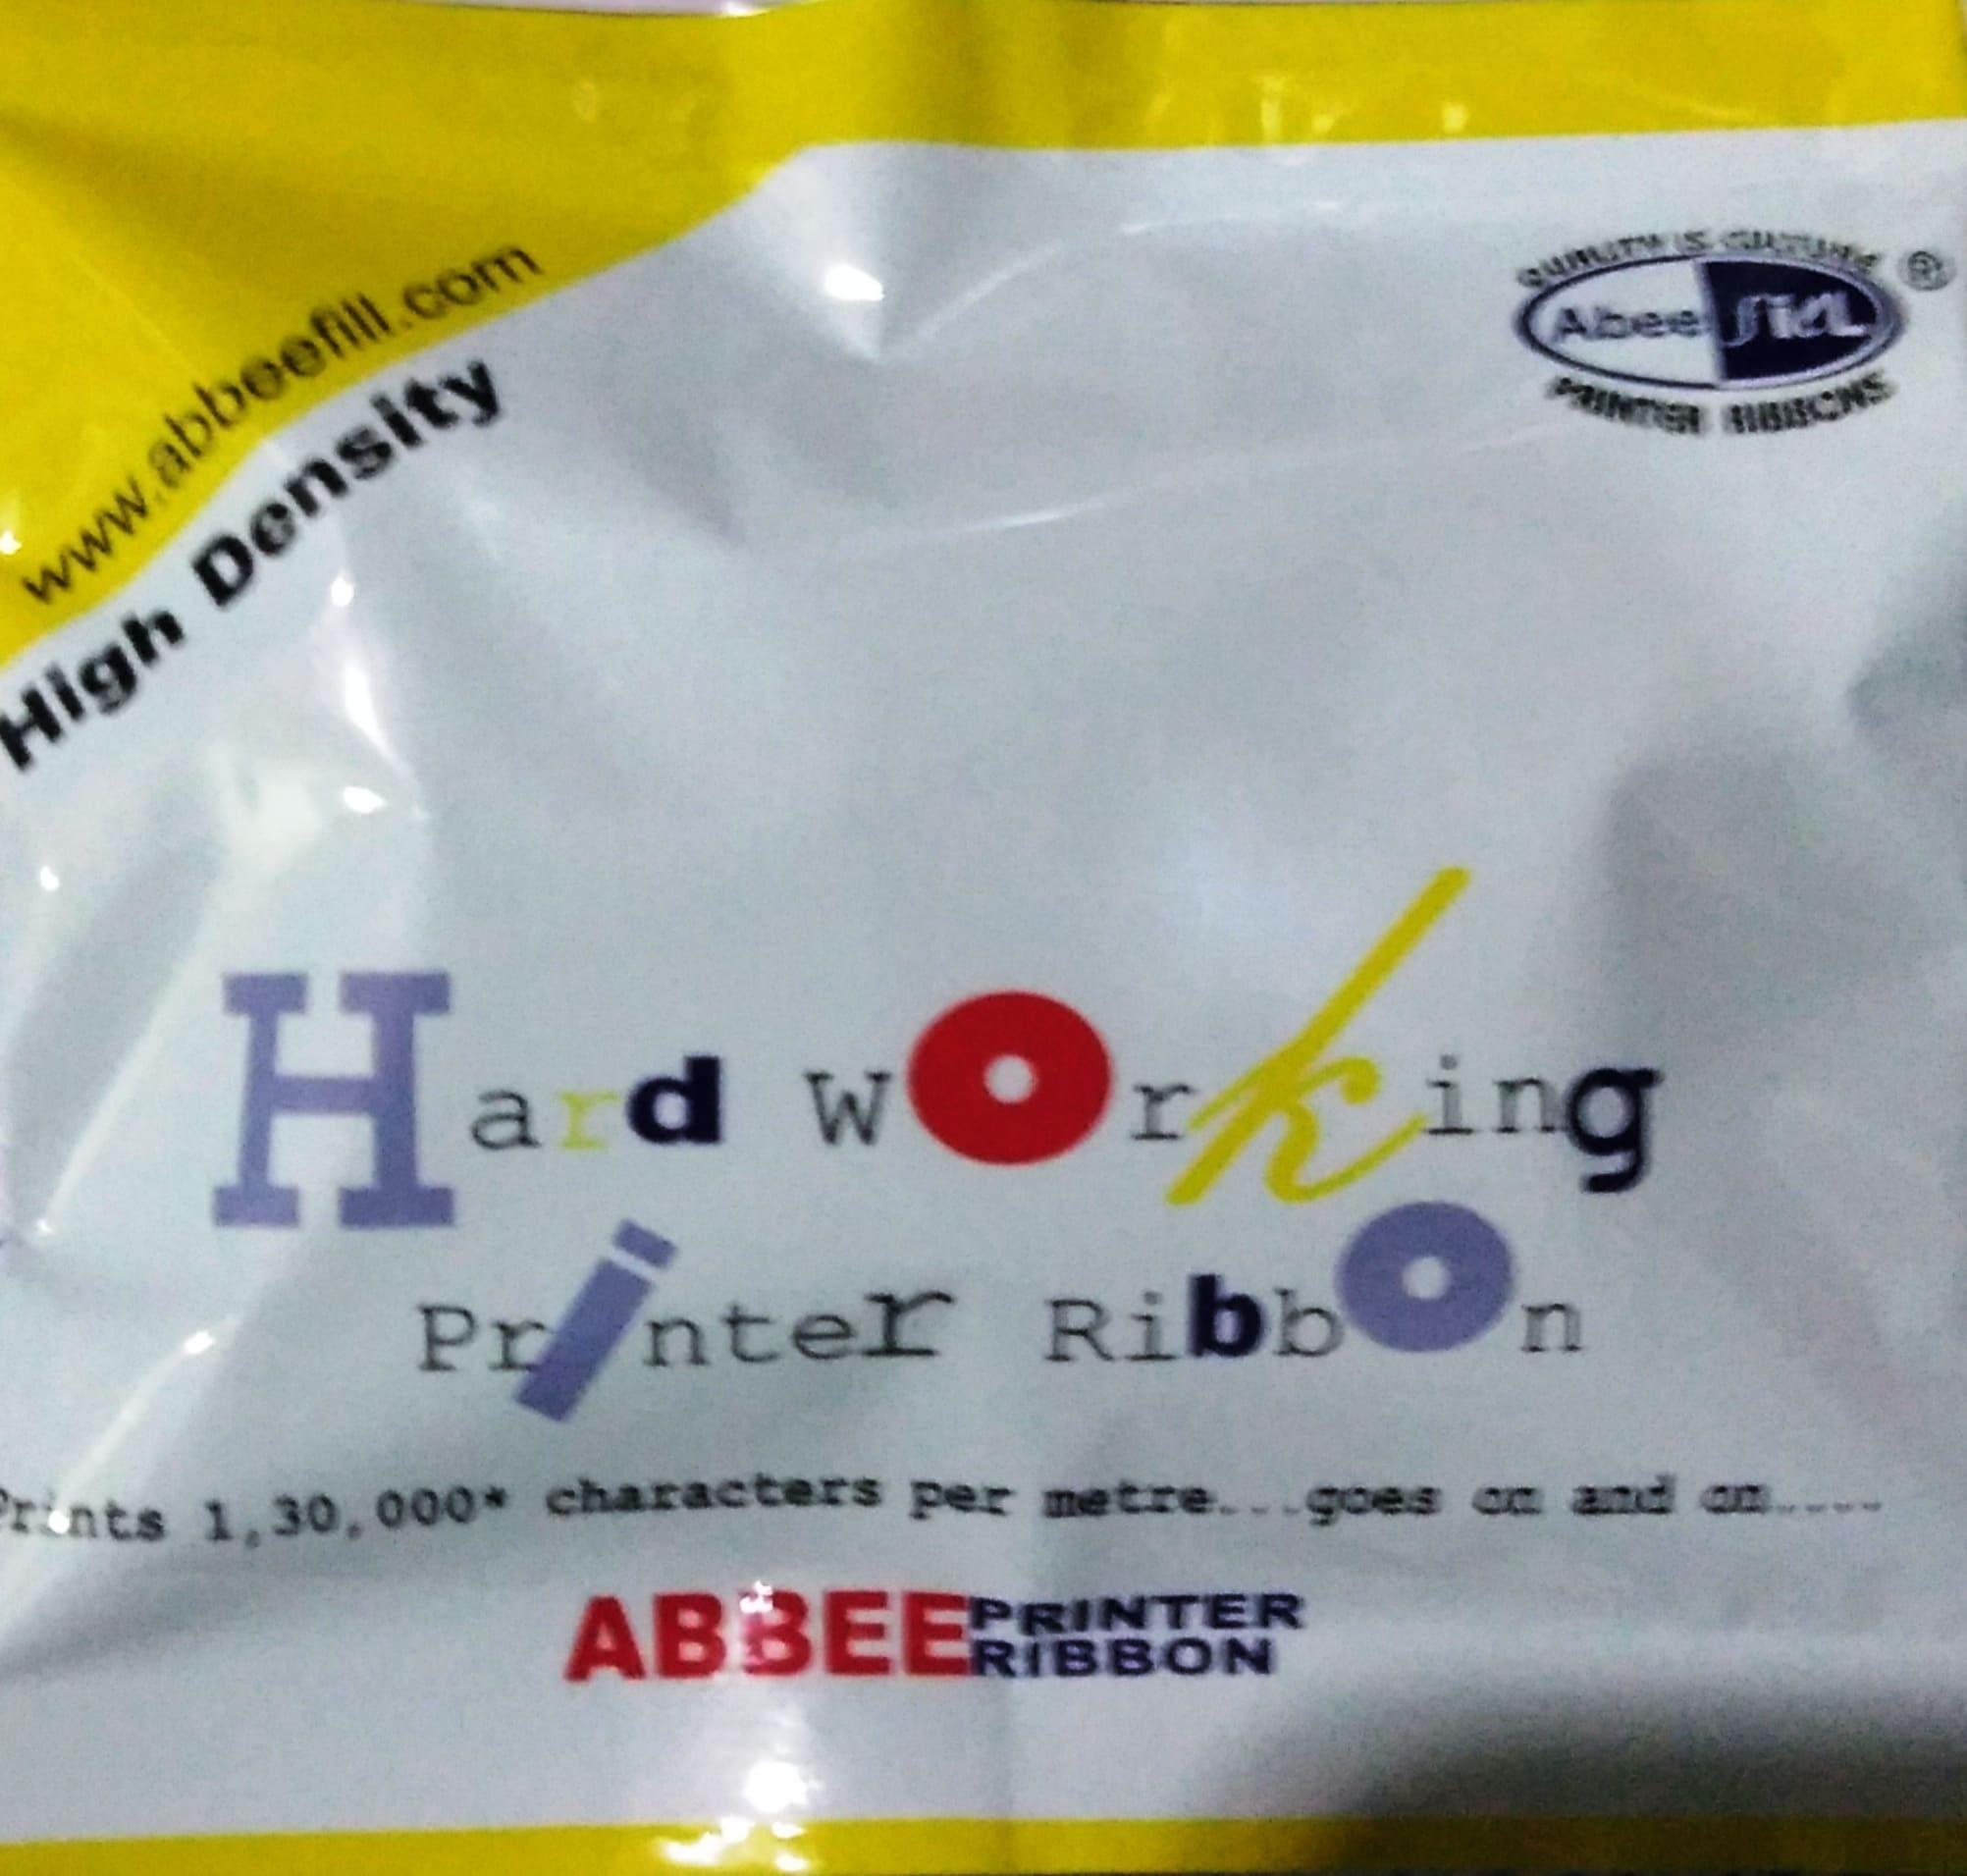 AB 13*15 HD RIBBON